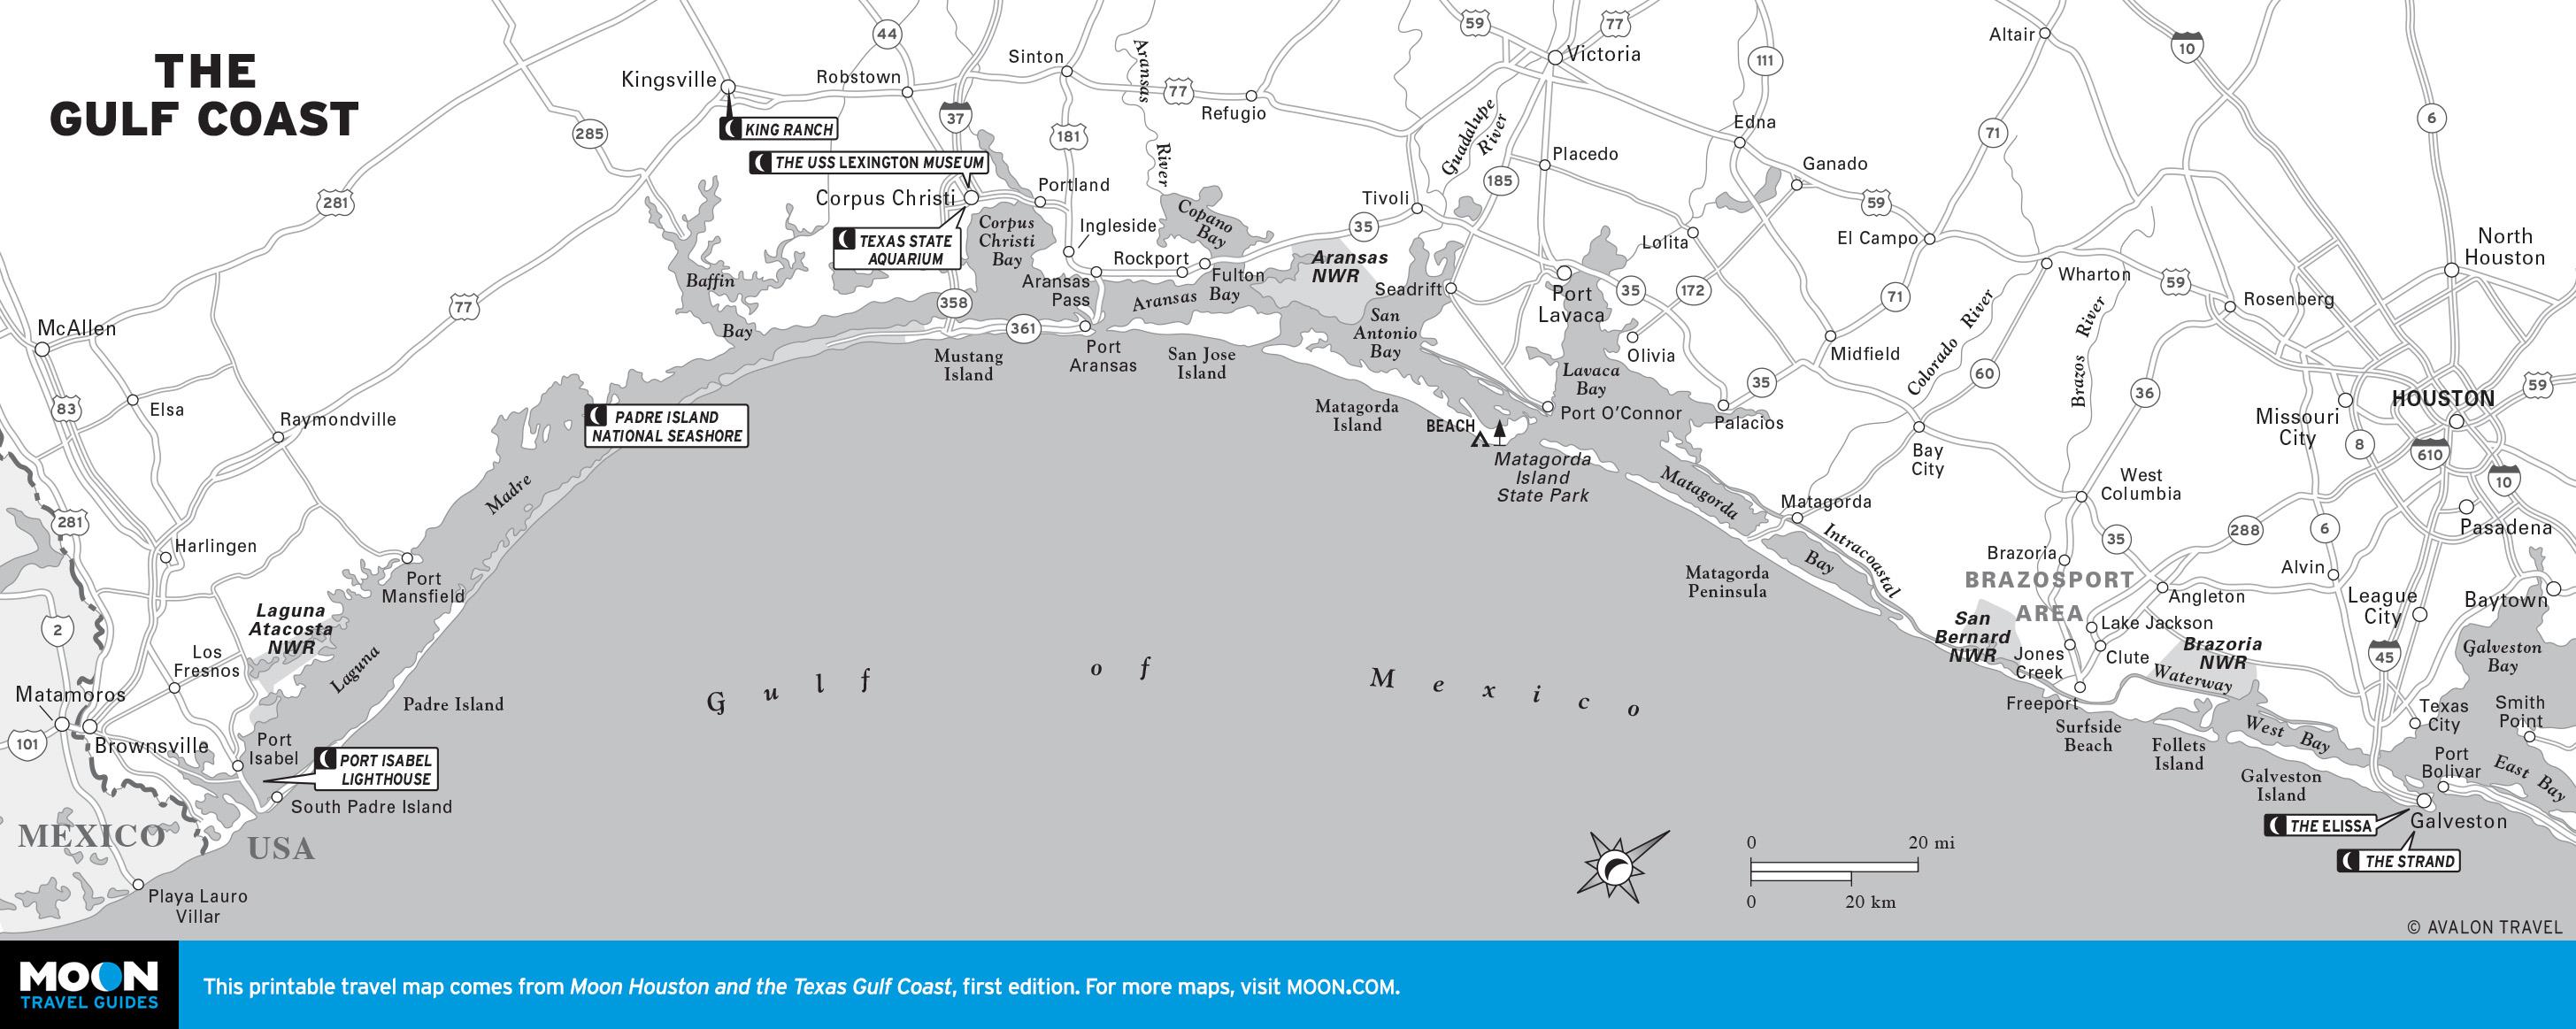 Map Of Texas Coast | Business Ideas 2013 - Luckenbach Texas Map